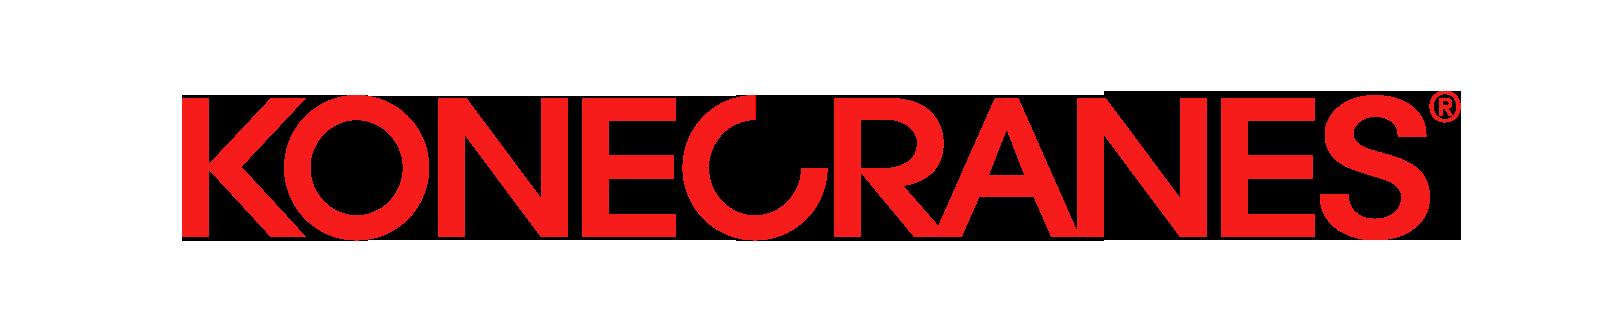 Konecranes-Logo